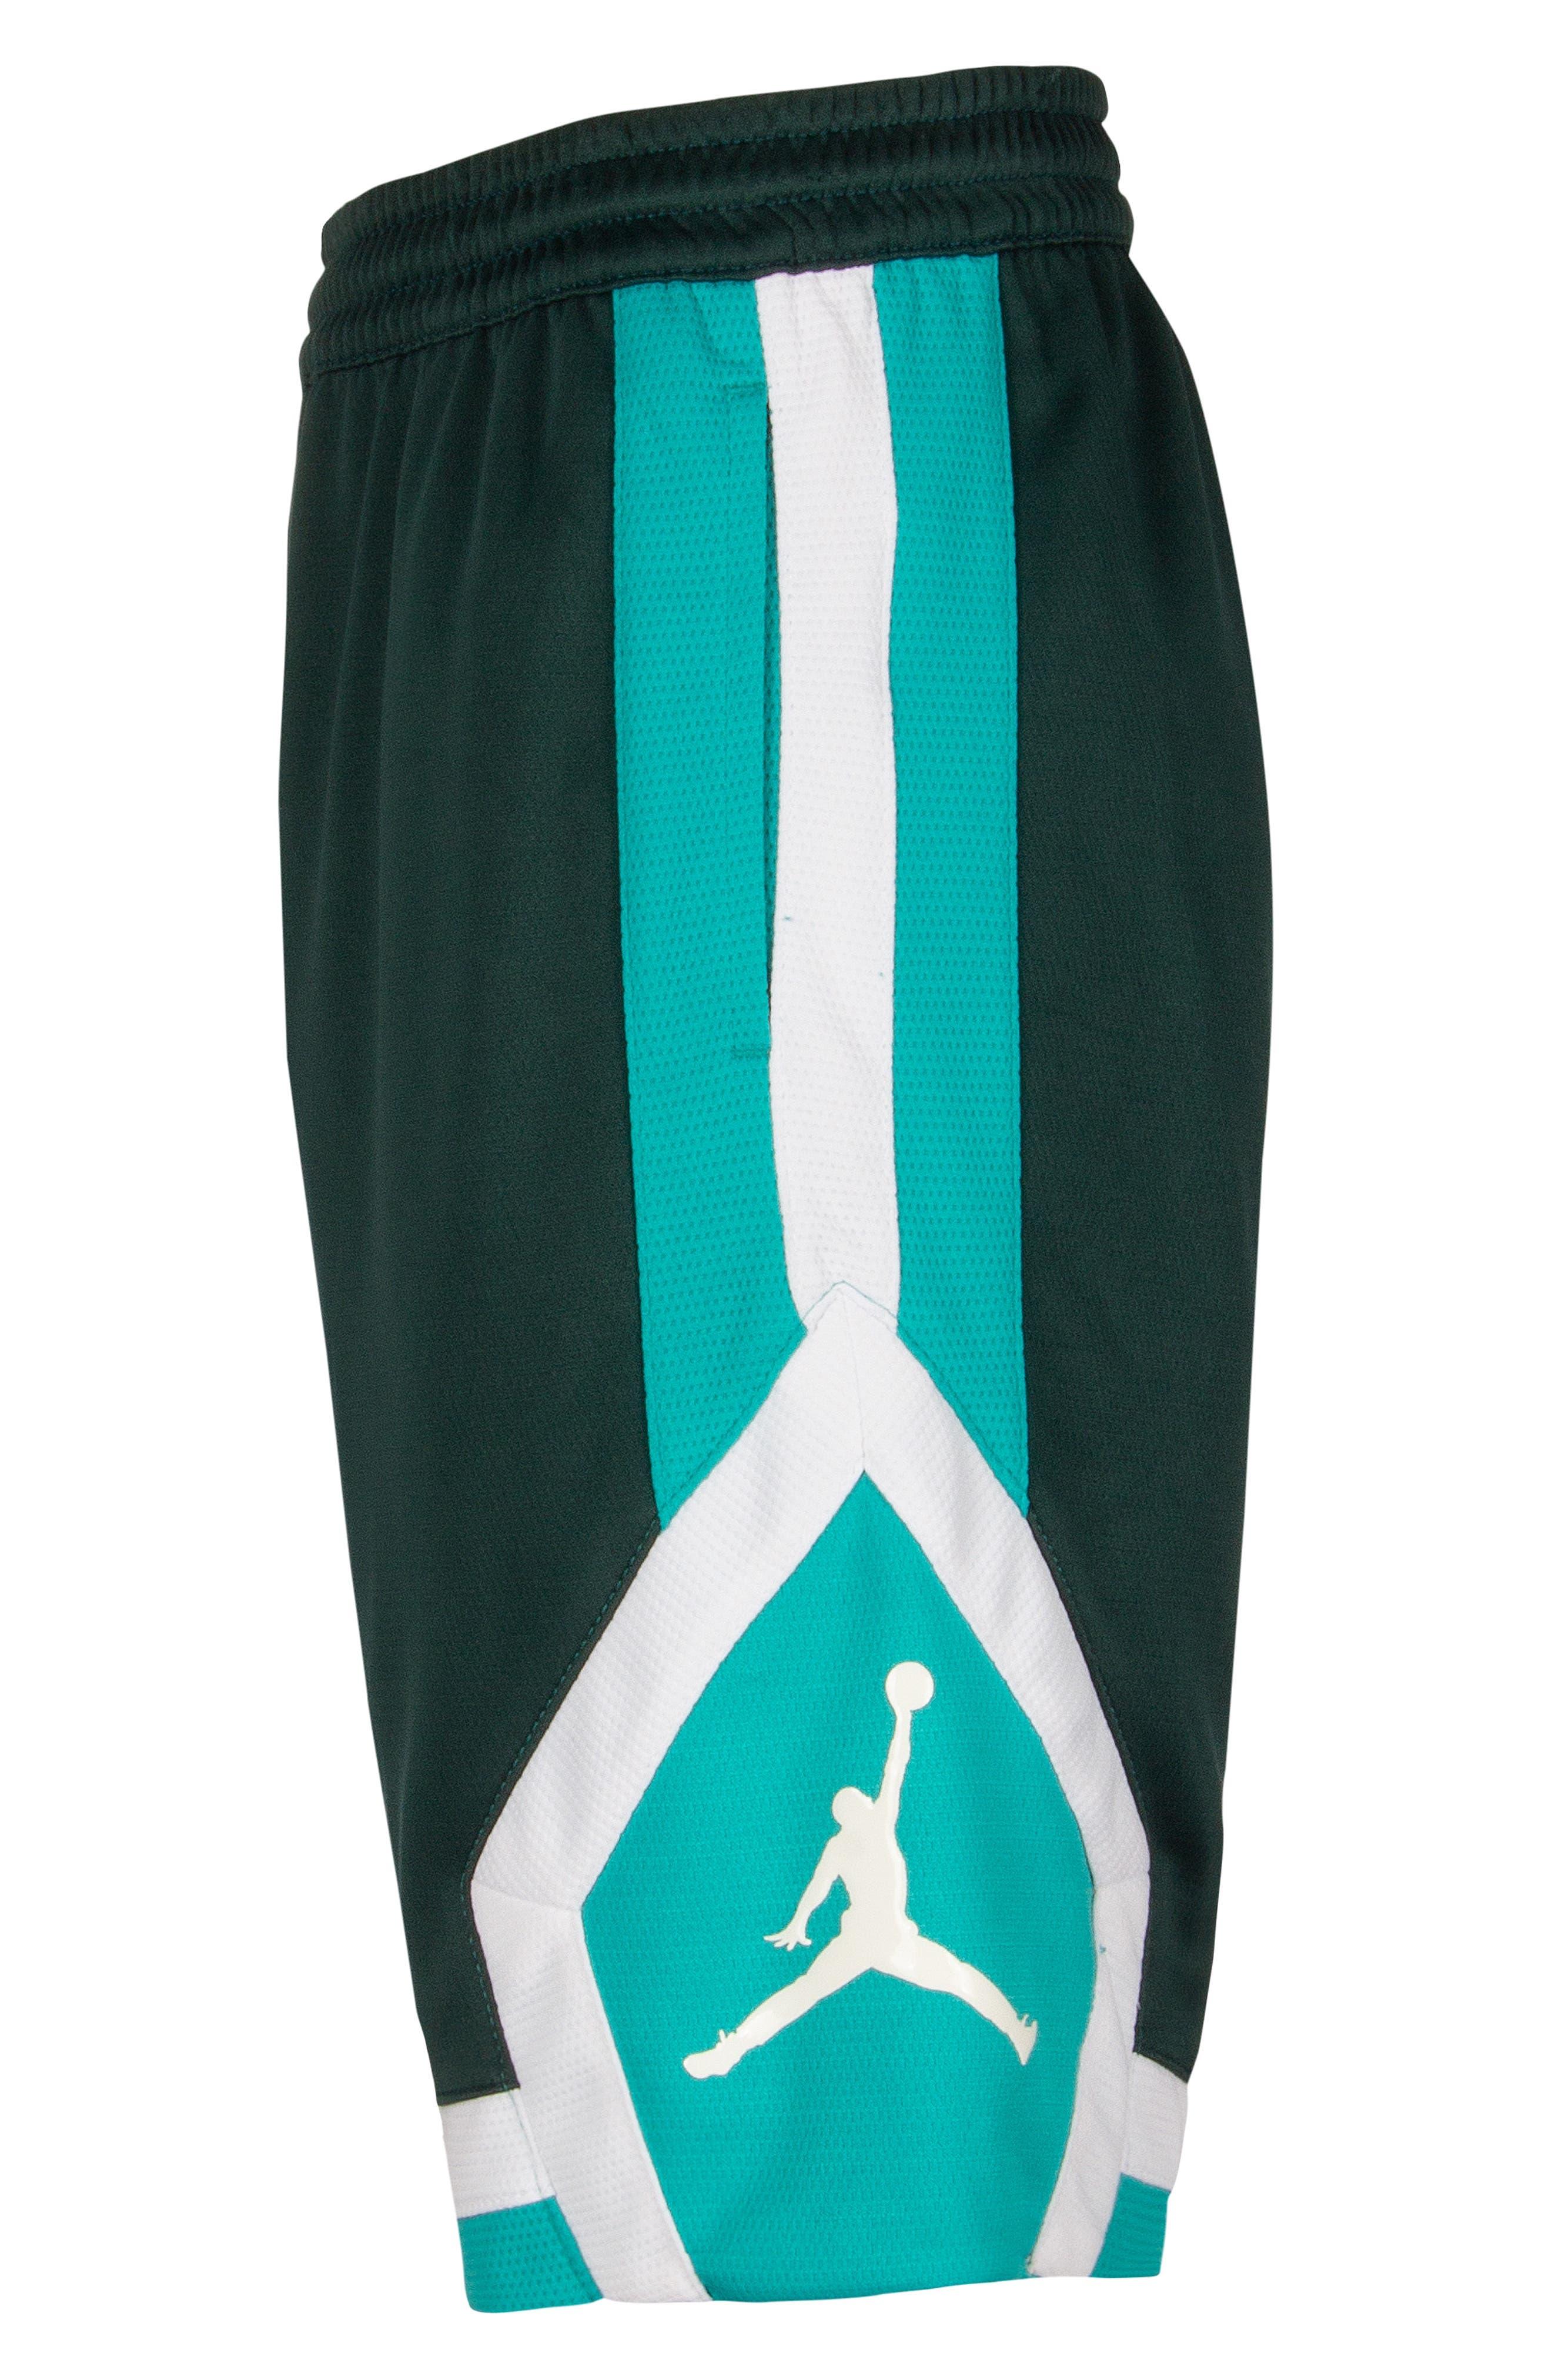 Jordan Rise Athletic Shorts,                             Alternate thumbnail 5, color,                             MIDNIGHT SPRUCE